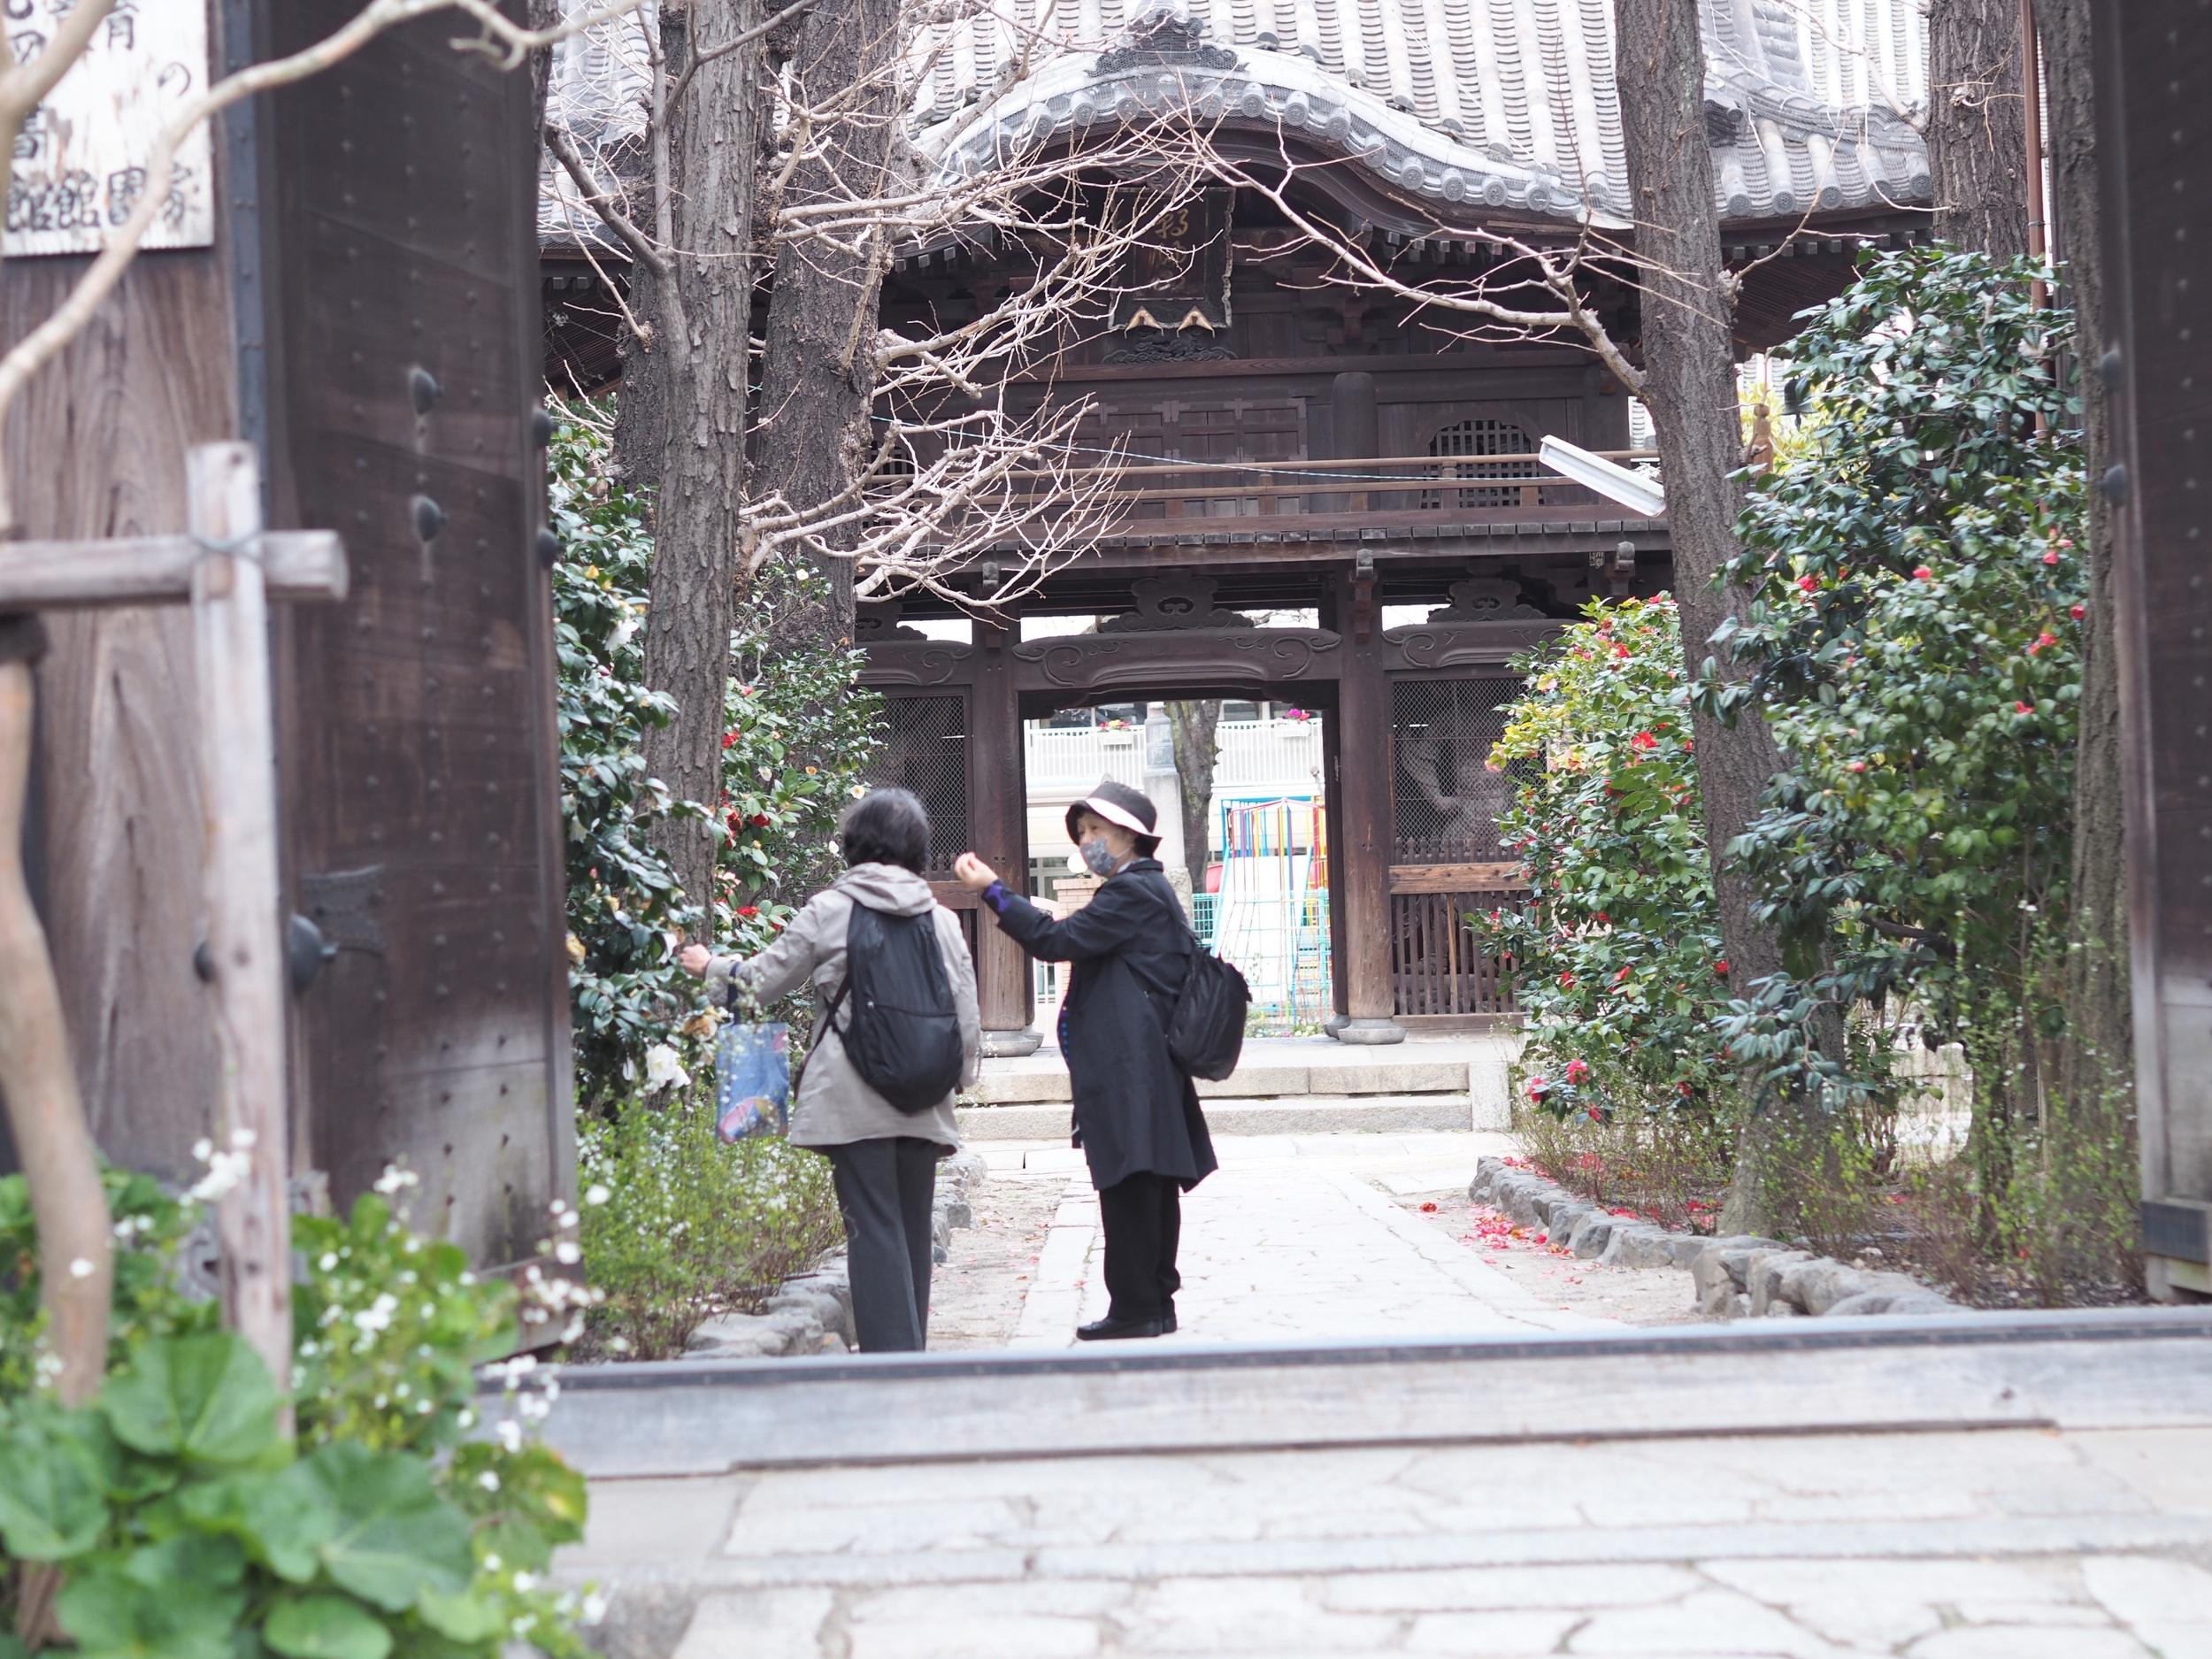 A side Street near Sanjio